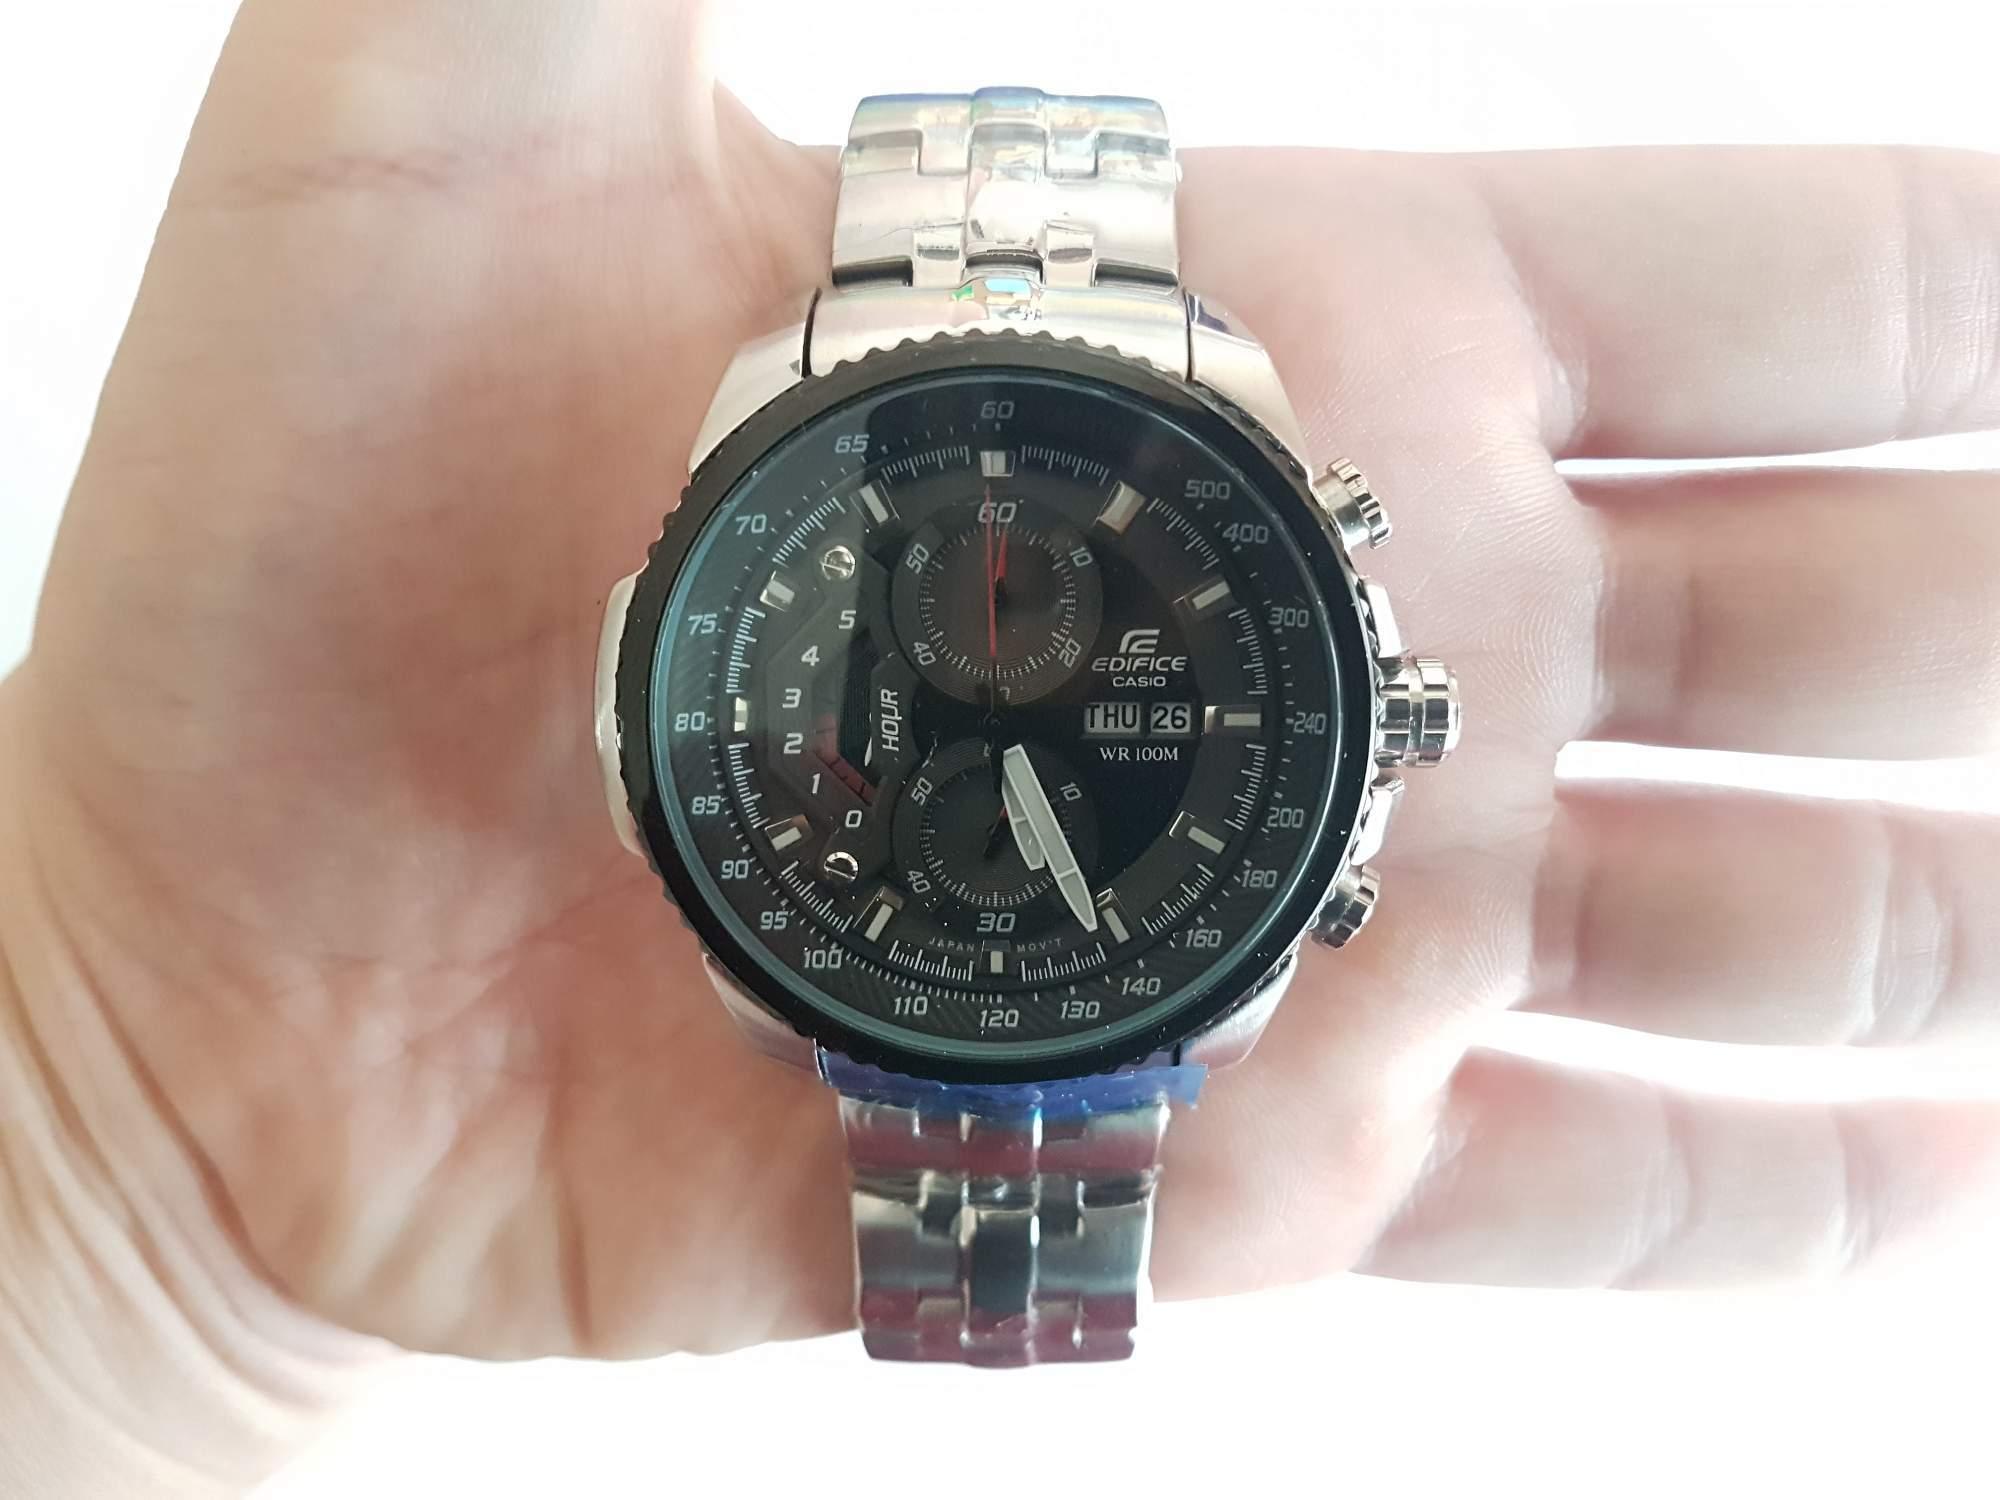 Hodinky Casio Edifice Chronograph EF-558D-1AV - aukce online - auktiva be49c2ea58